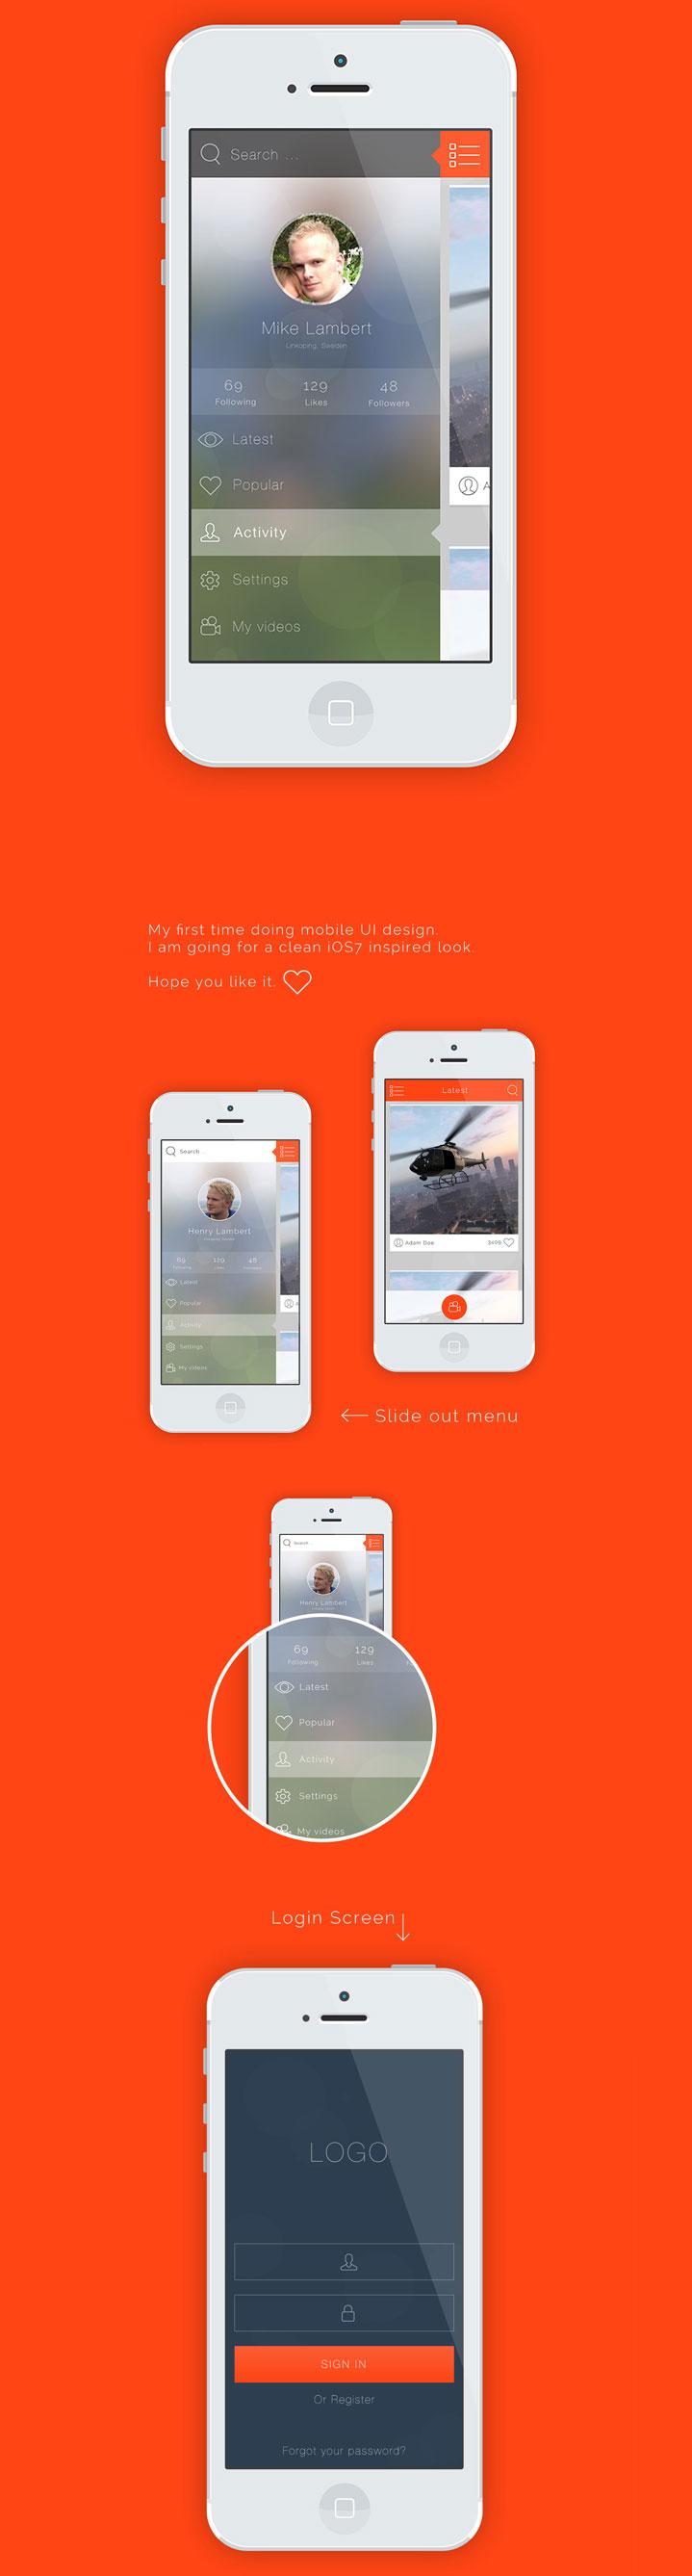 mobil-arayuz-tasarlama